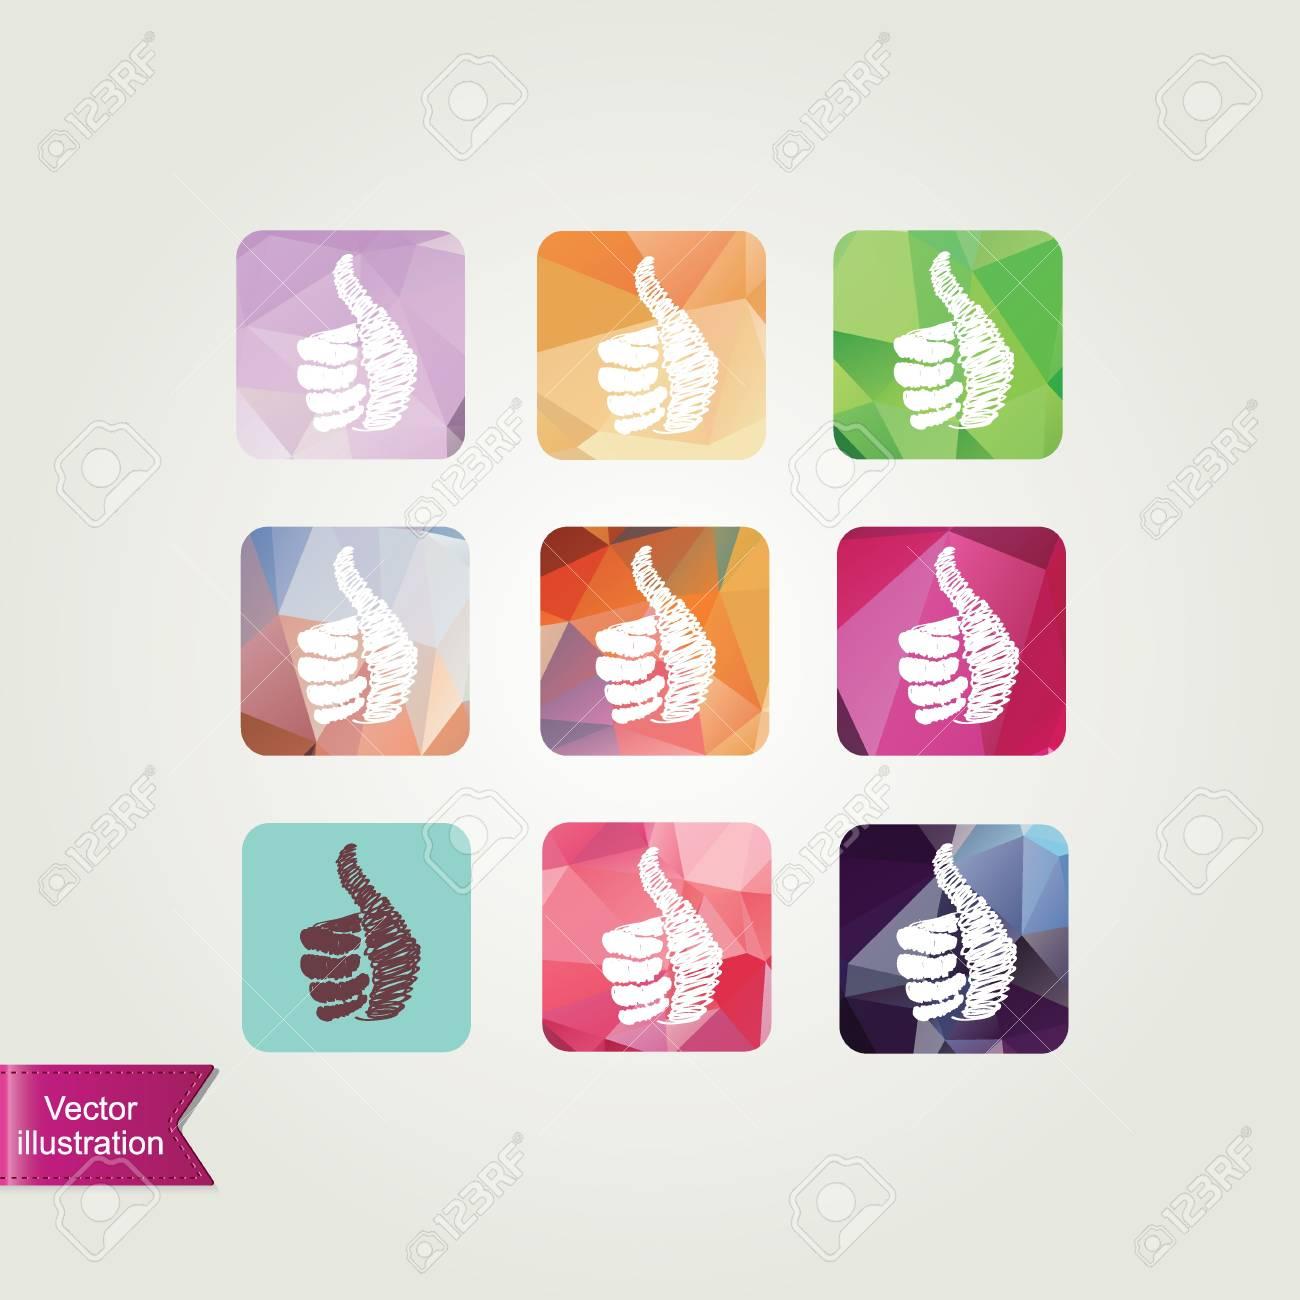 Set like icons illustration Stock Vector - 20190697